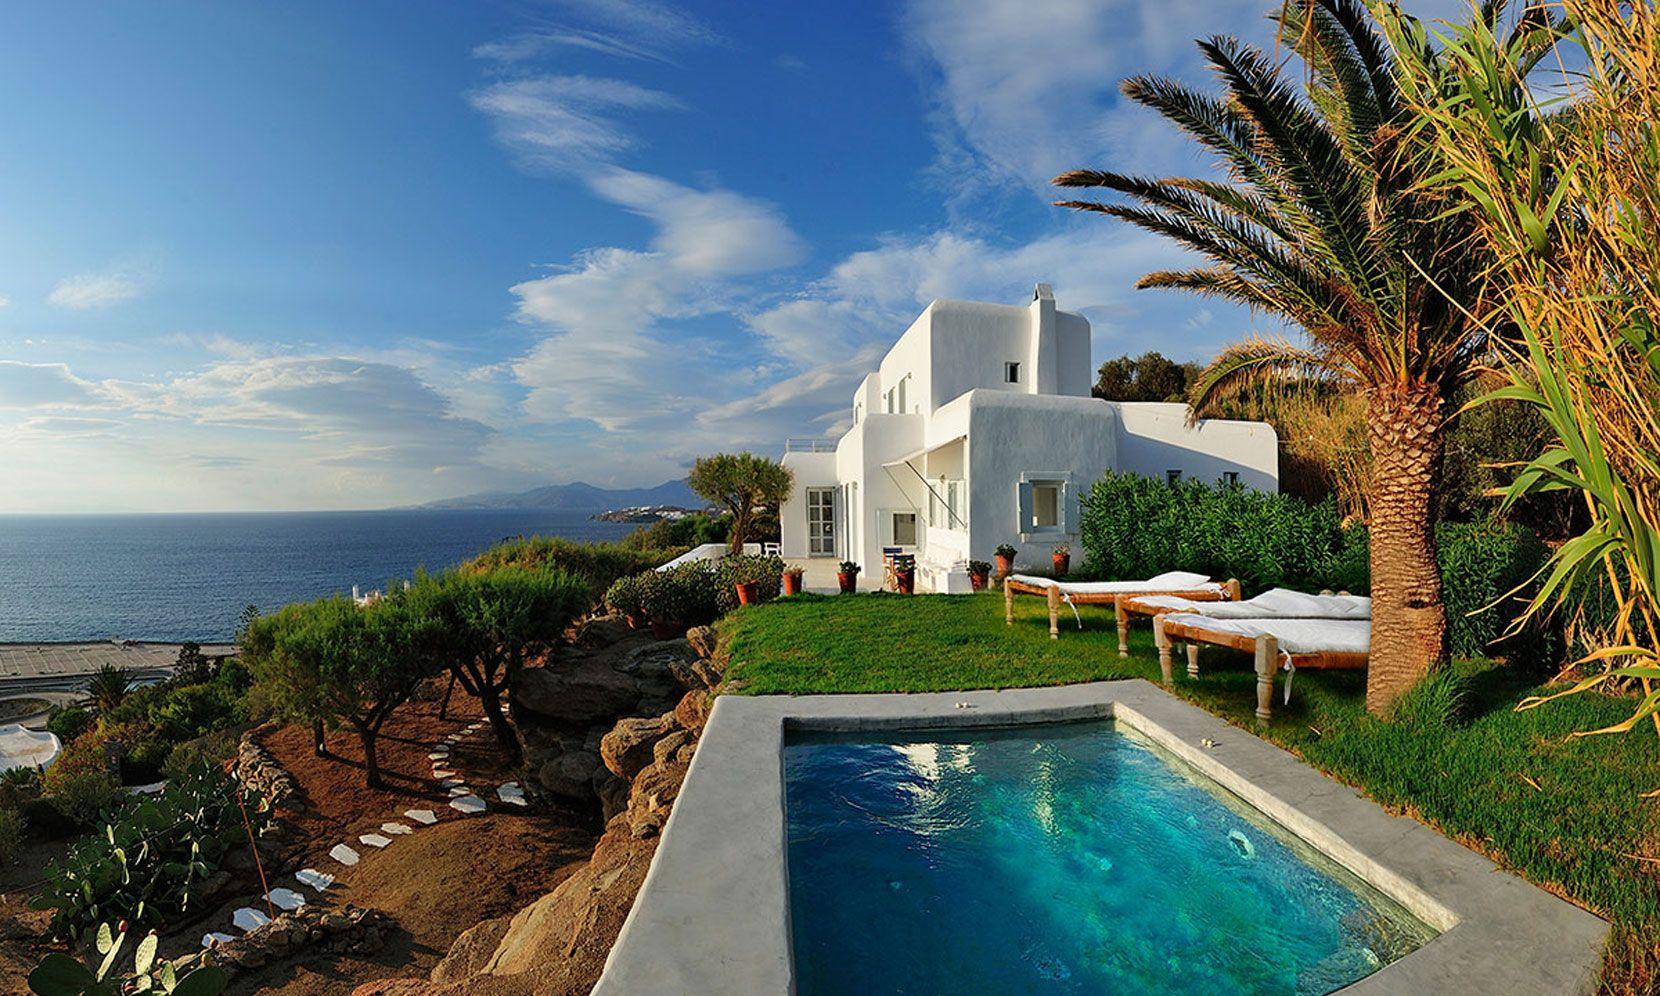 Mykonos Villa Elea jumbotron image